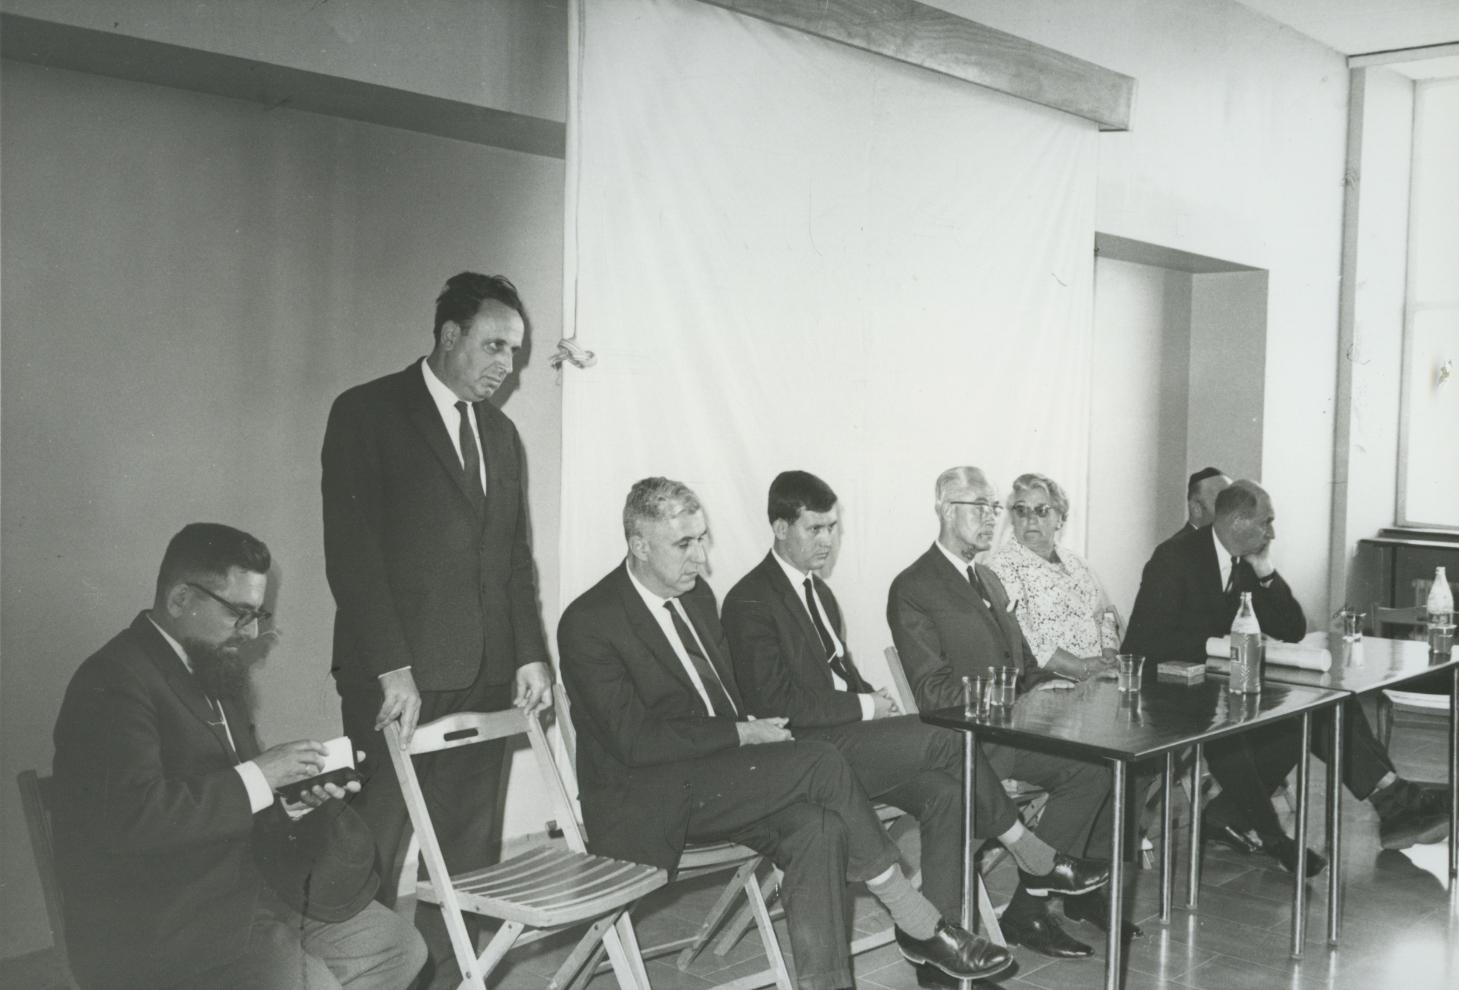 Tree Planting Ceremony in Honor of Wijsmuller Gertud. Yad Vashem. 13.04.1967